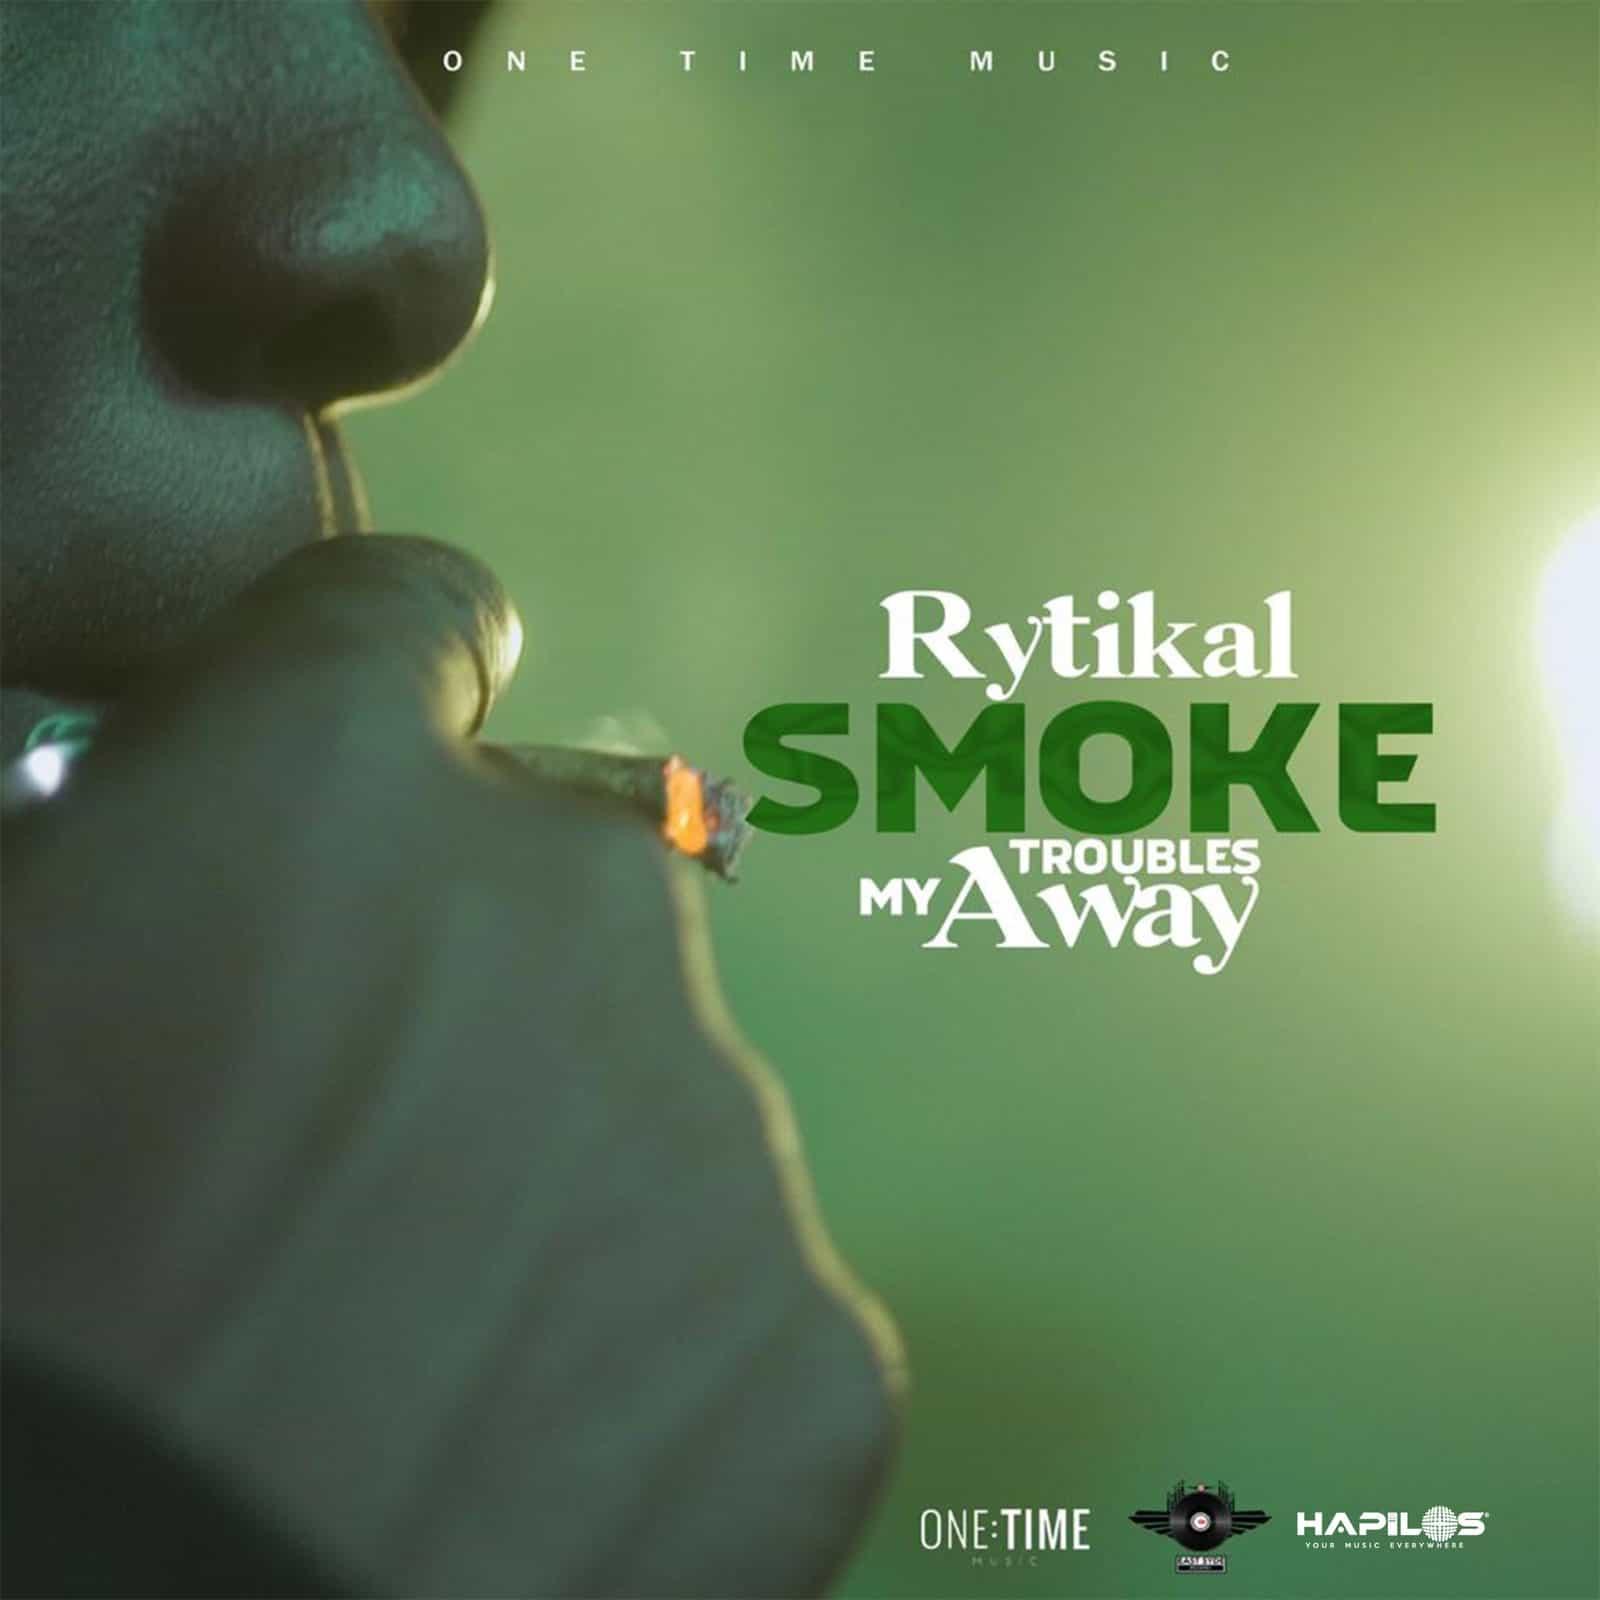 Rytikal - Smoke My Troubles Away - One Time Music